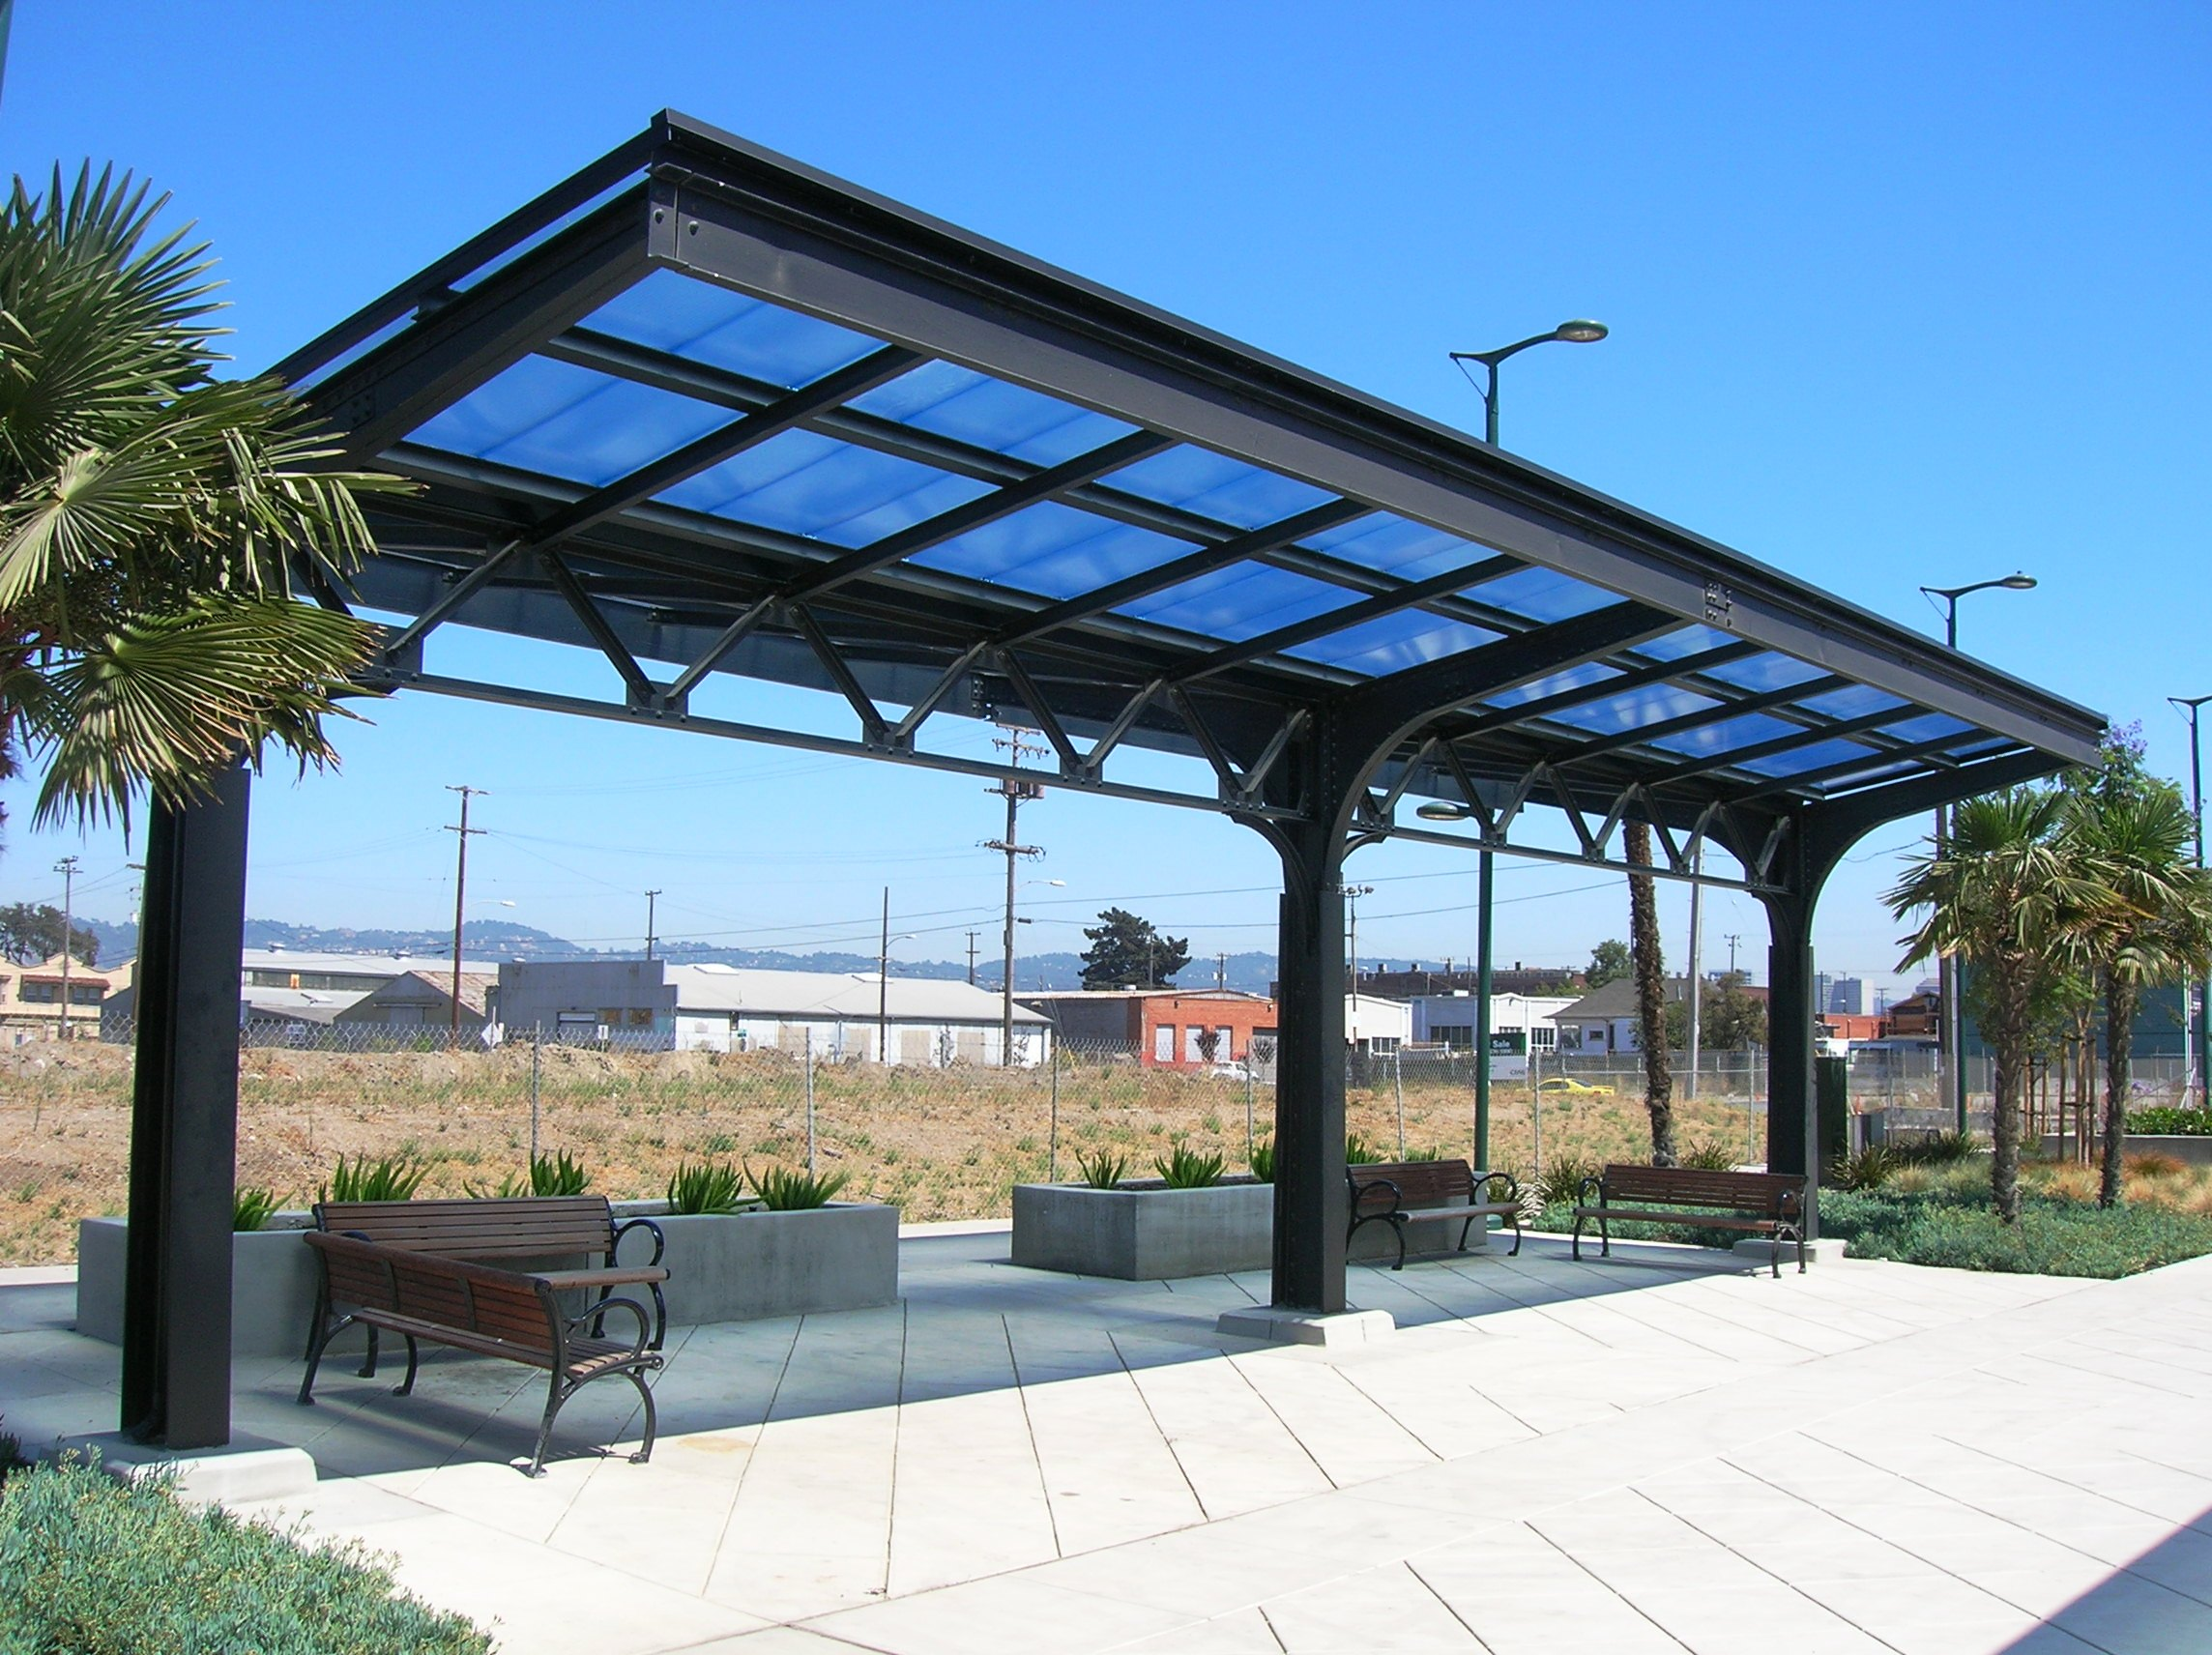 glass canopy.jpg